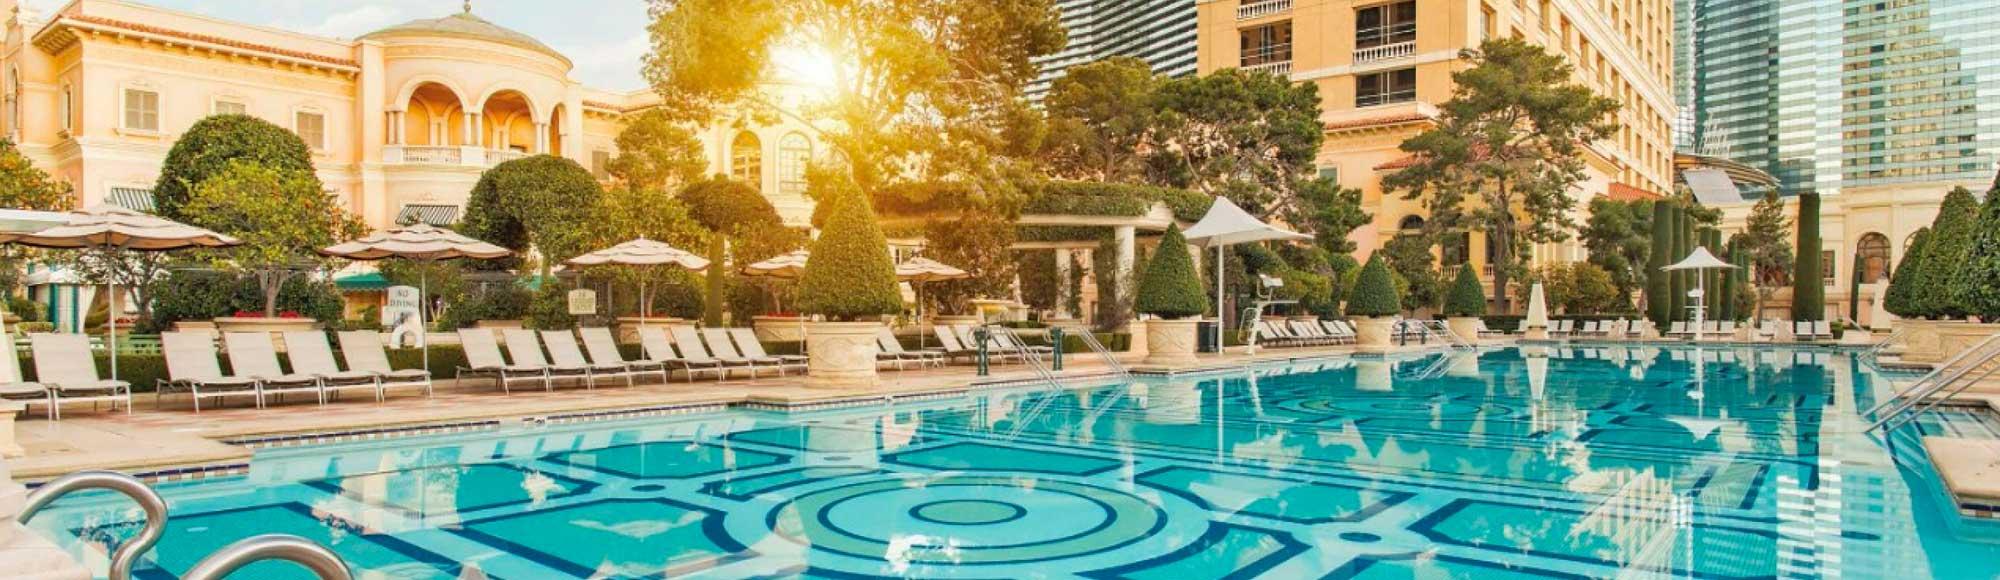 Bellagio Hotel Pool Information Hours Vegas Com